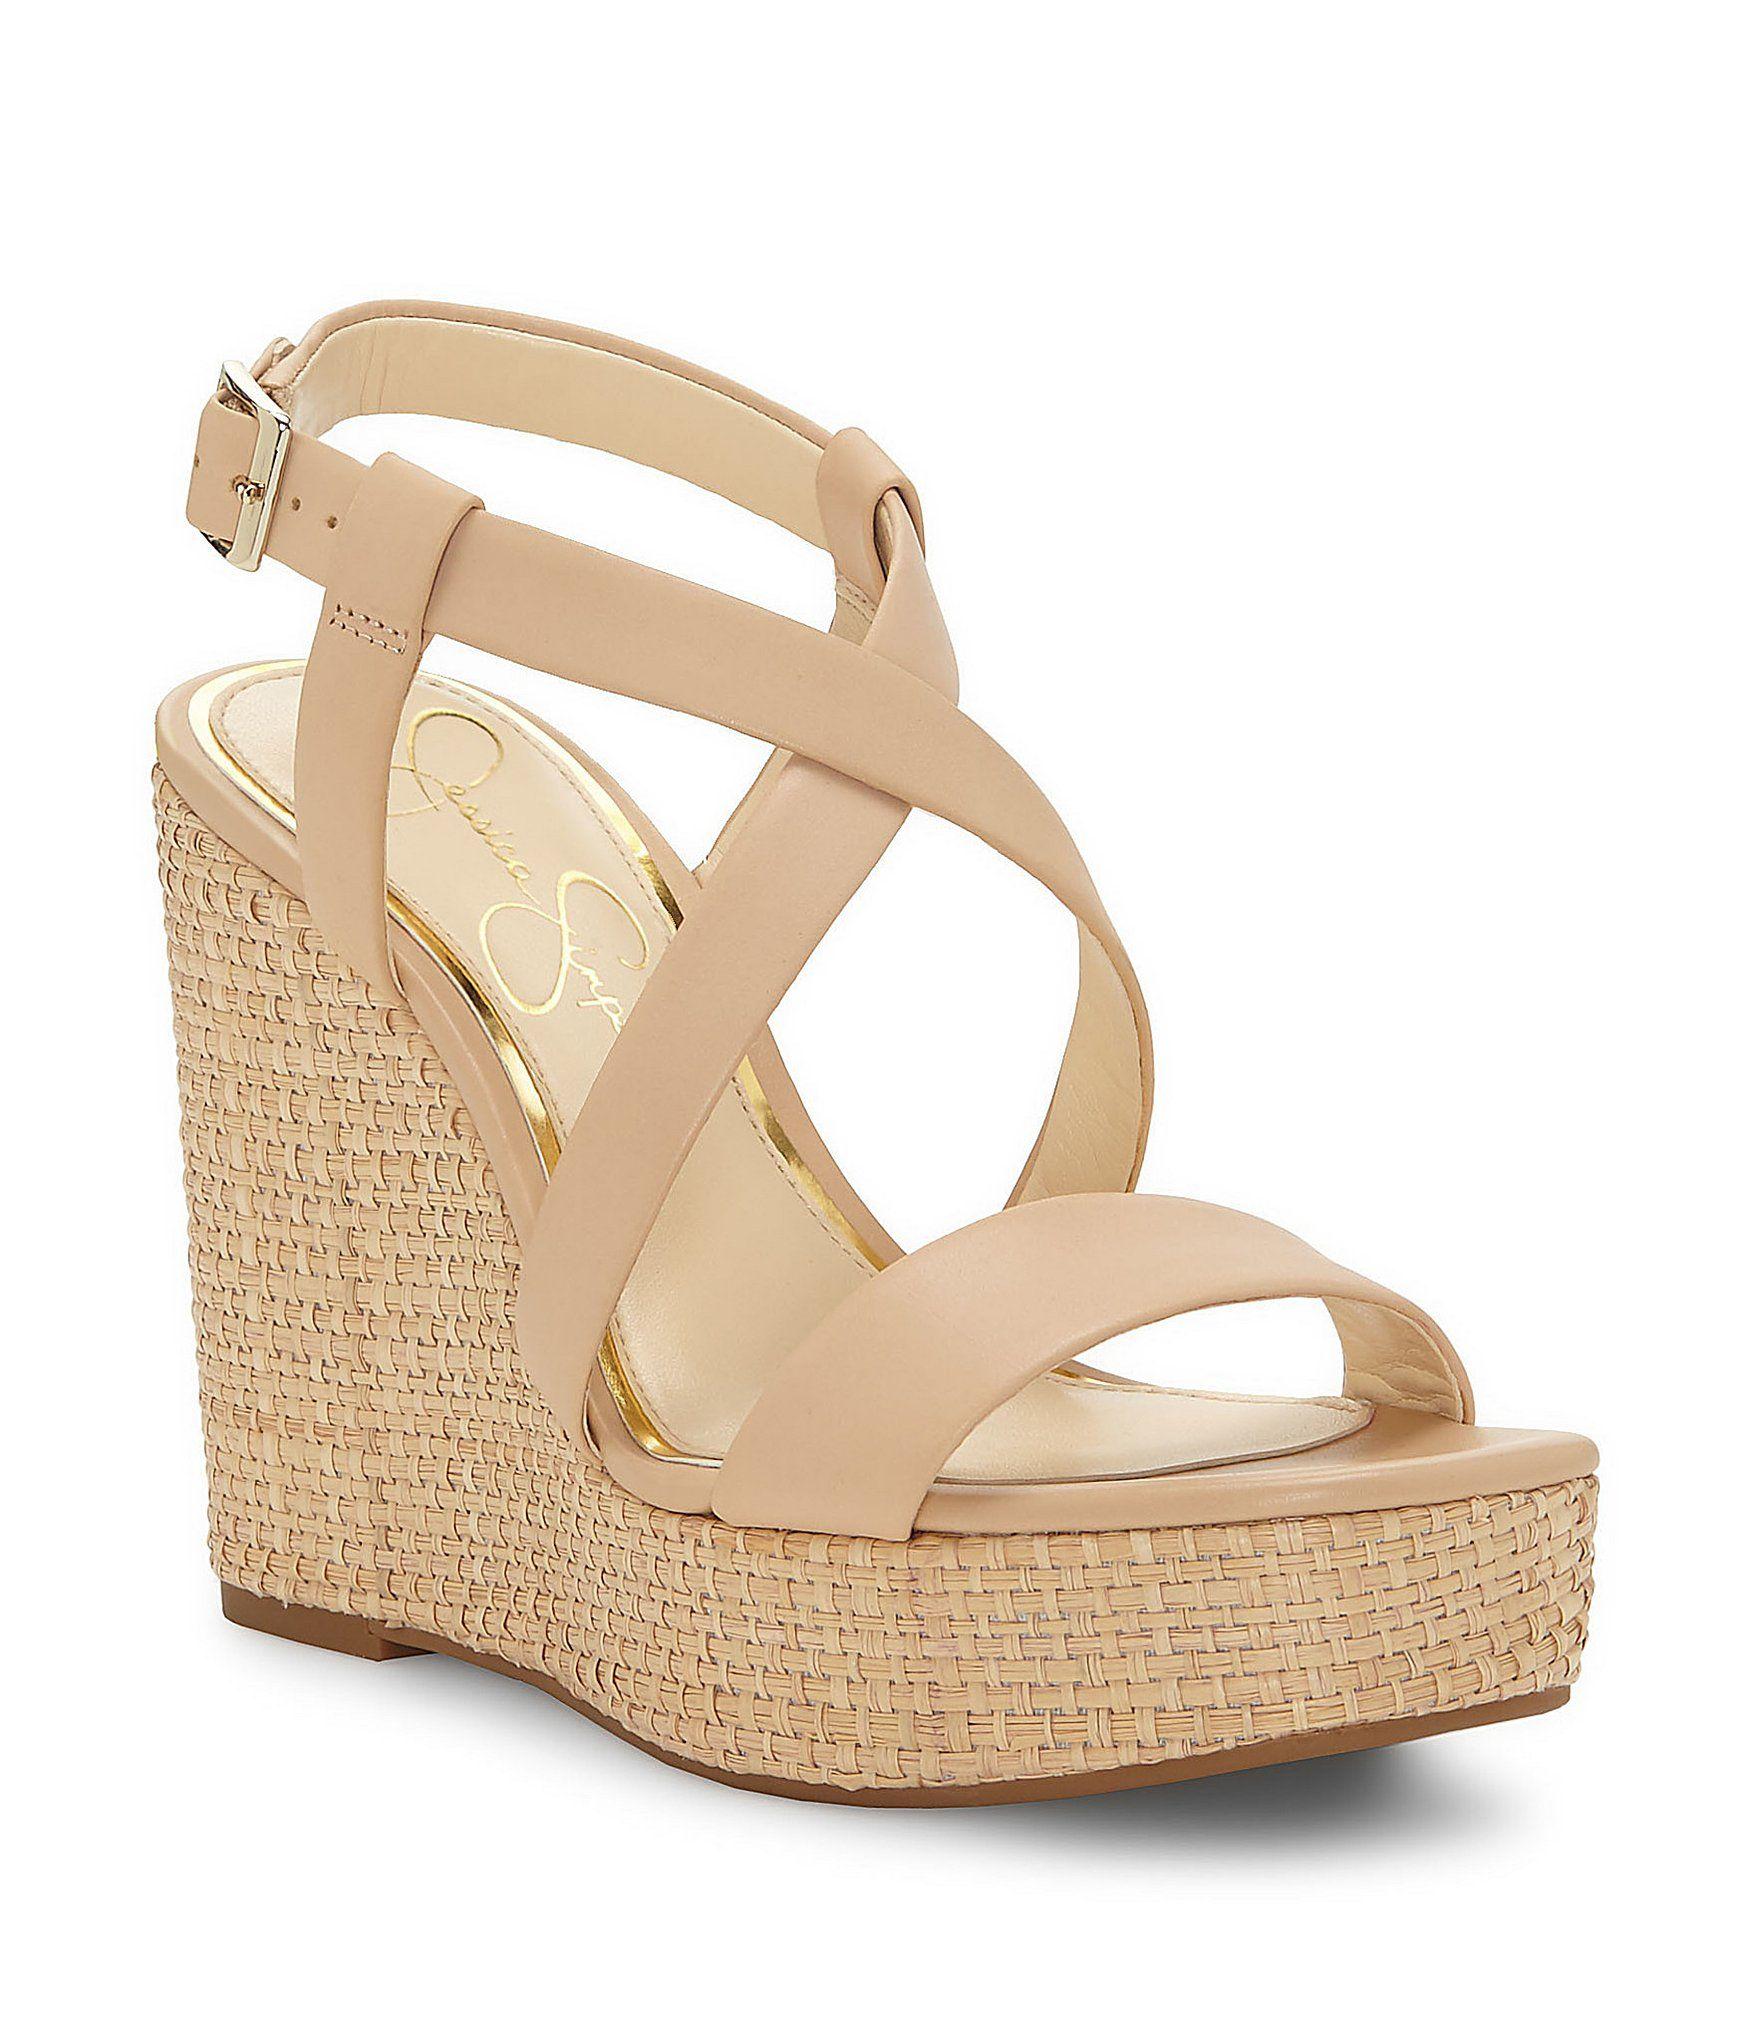 Jessica Simpson Salona Wedge Sandals gwESxco